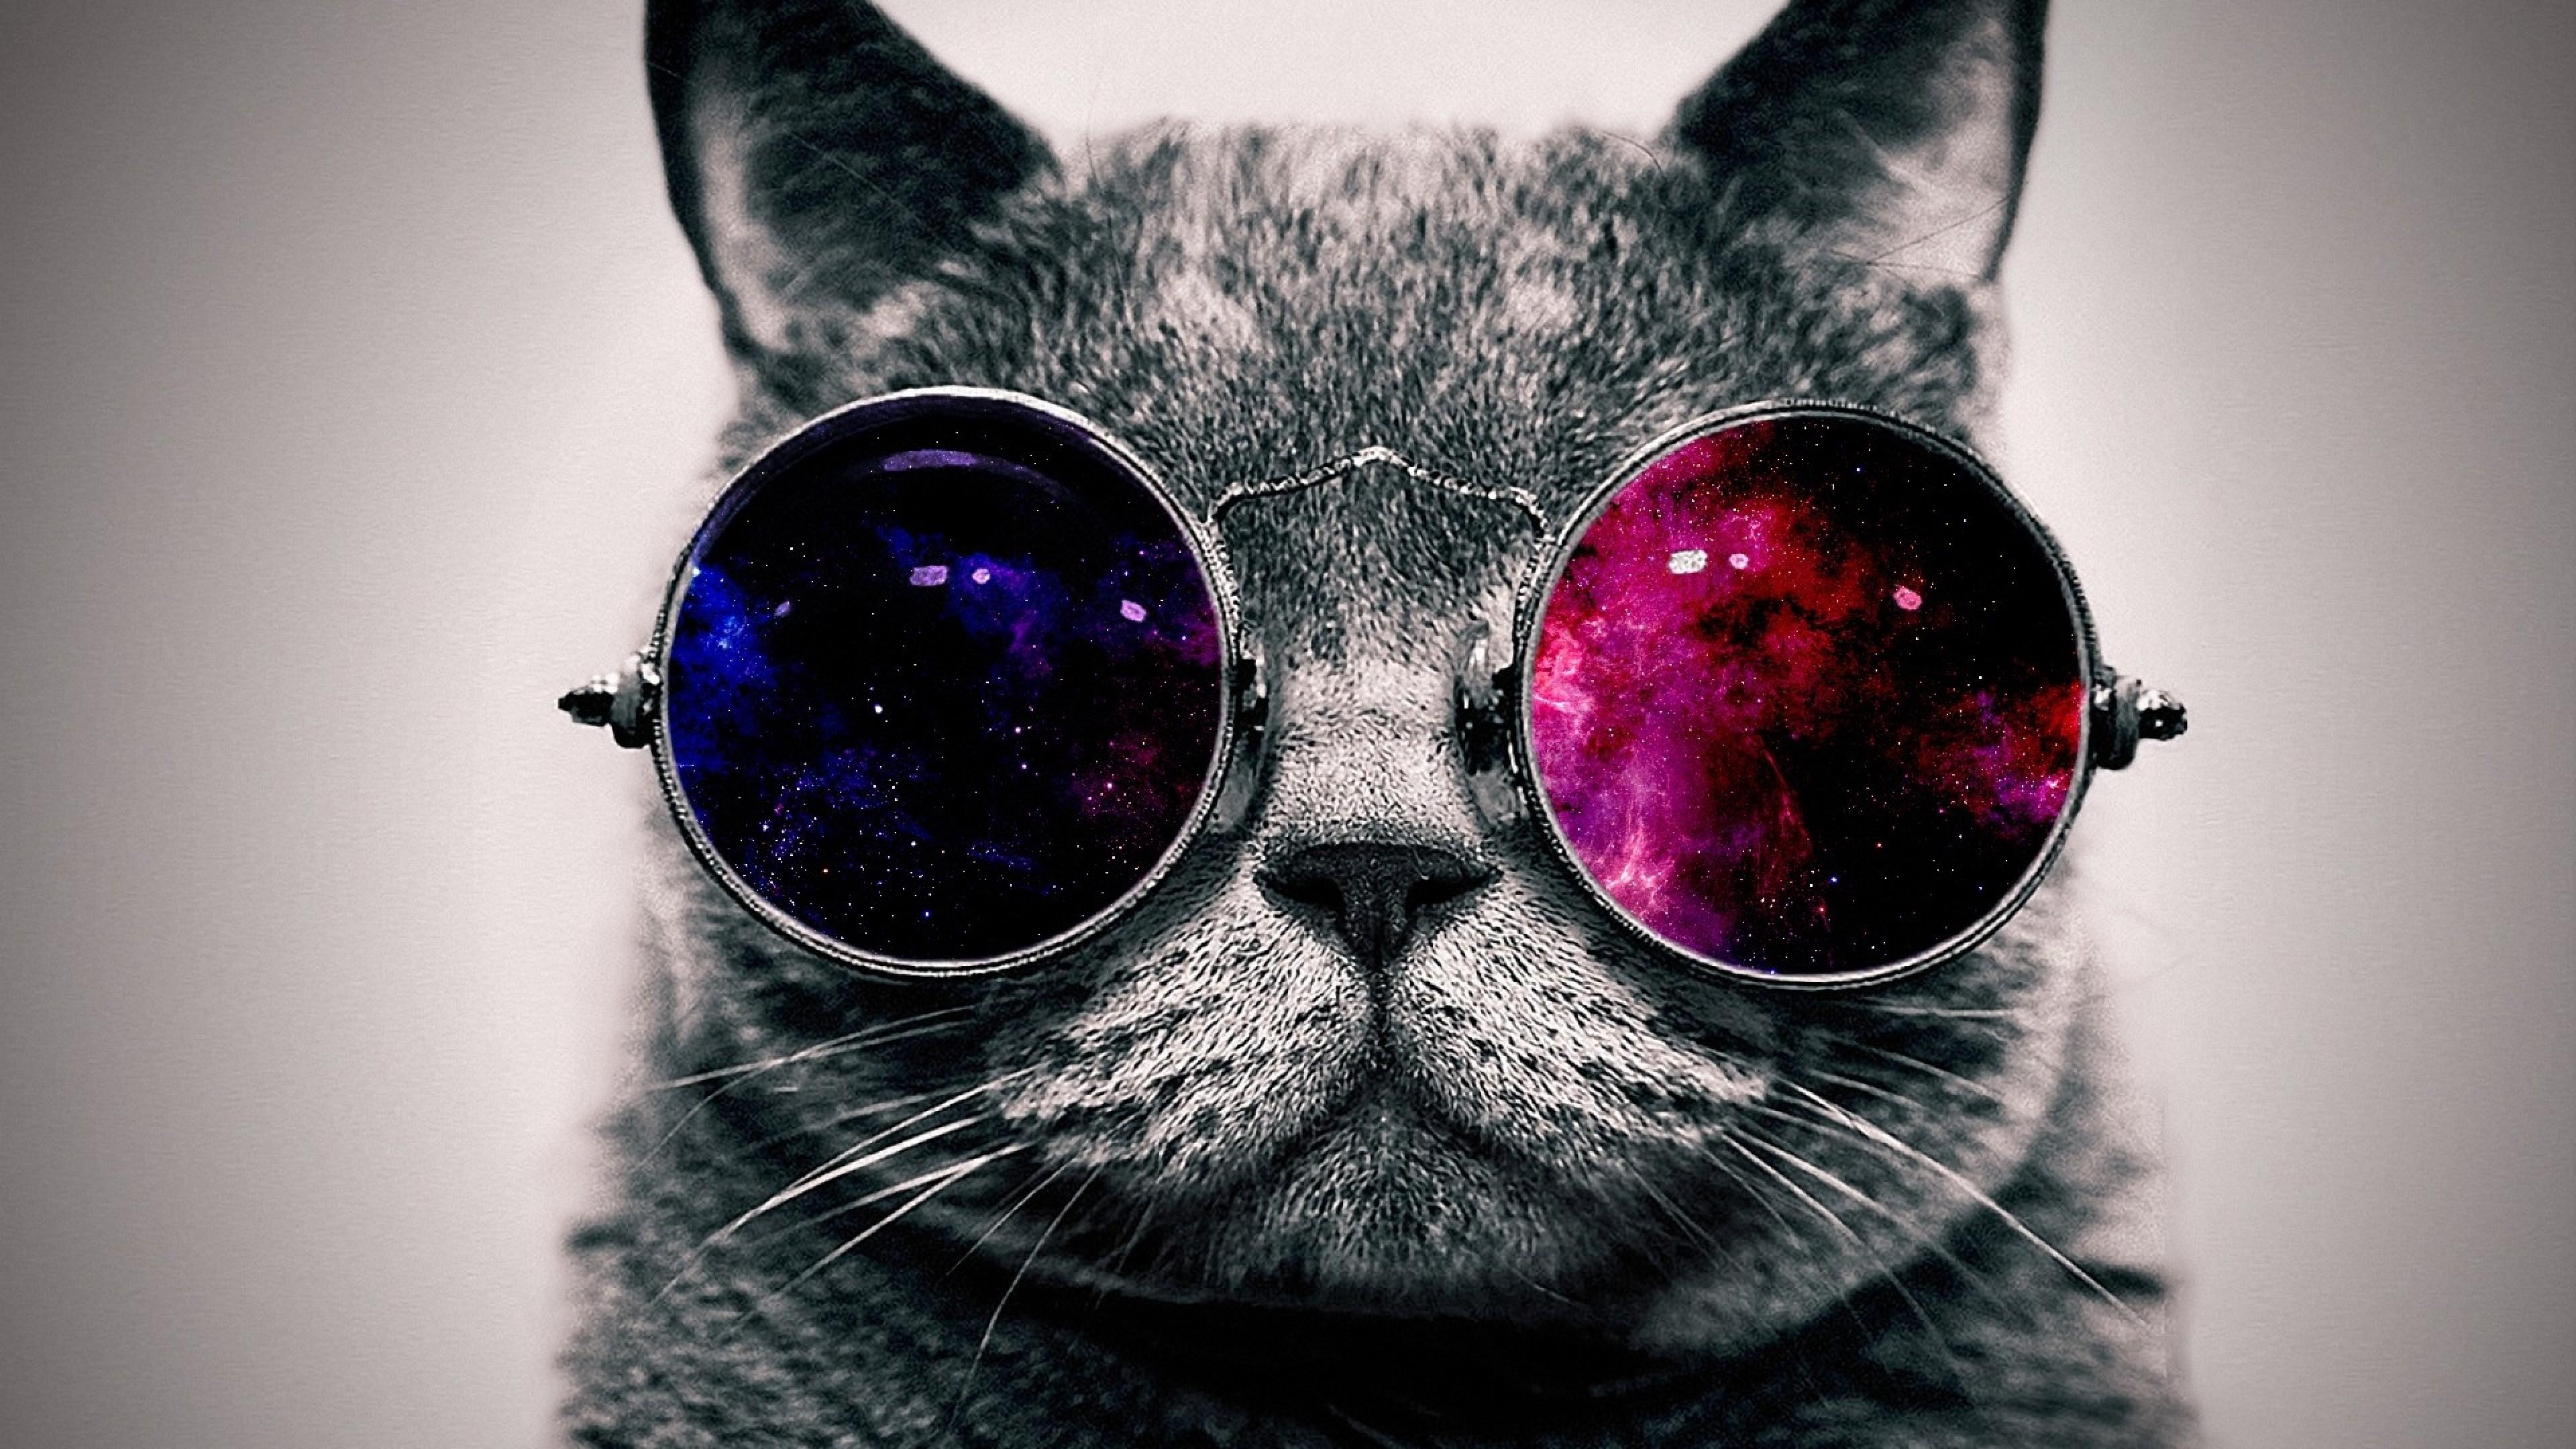 Funny Cat Wallpapers For Desktop 69 Images